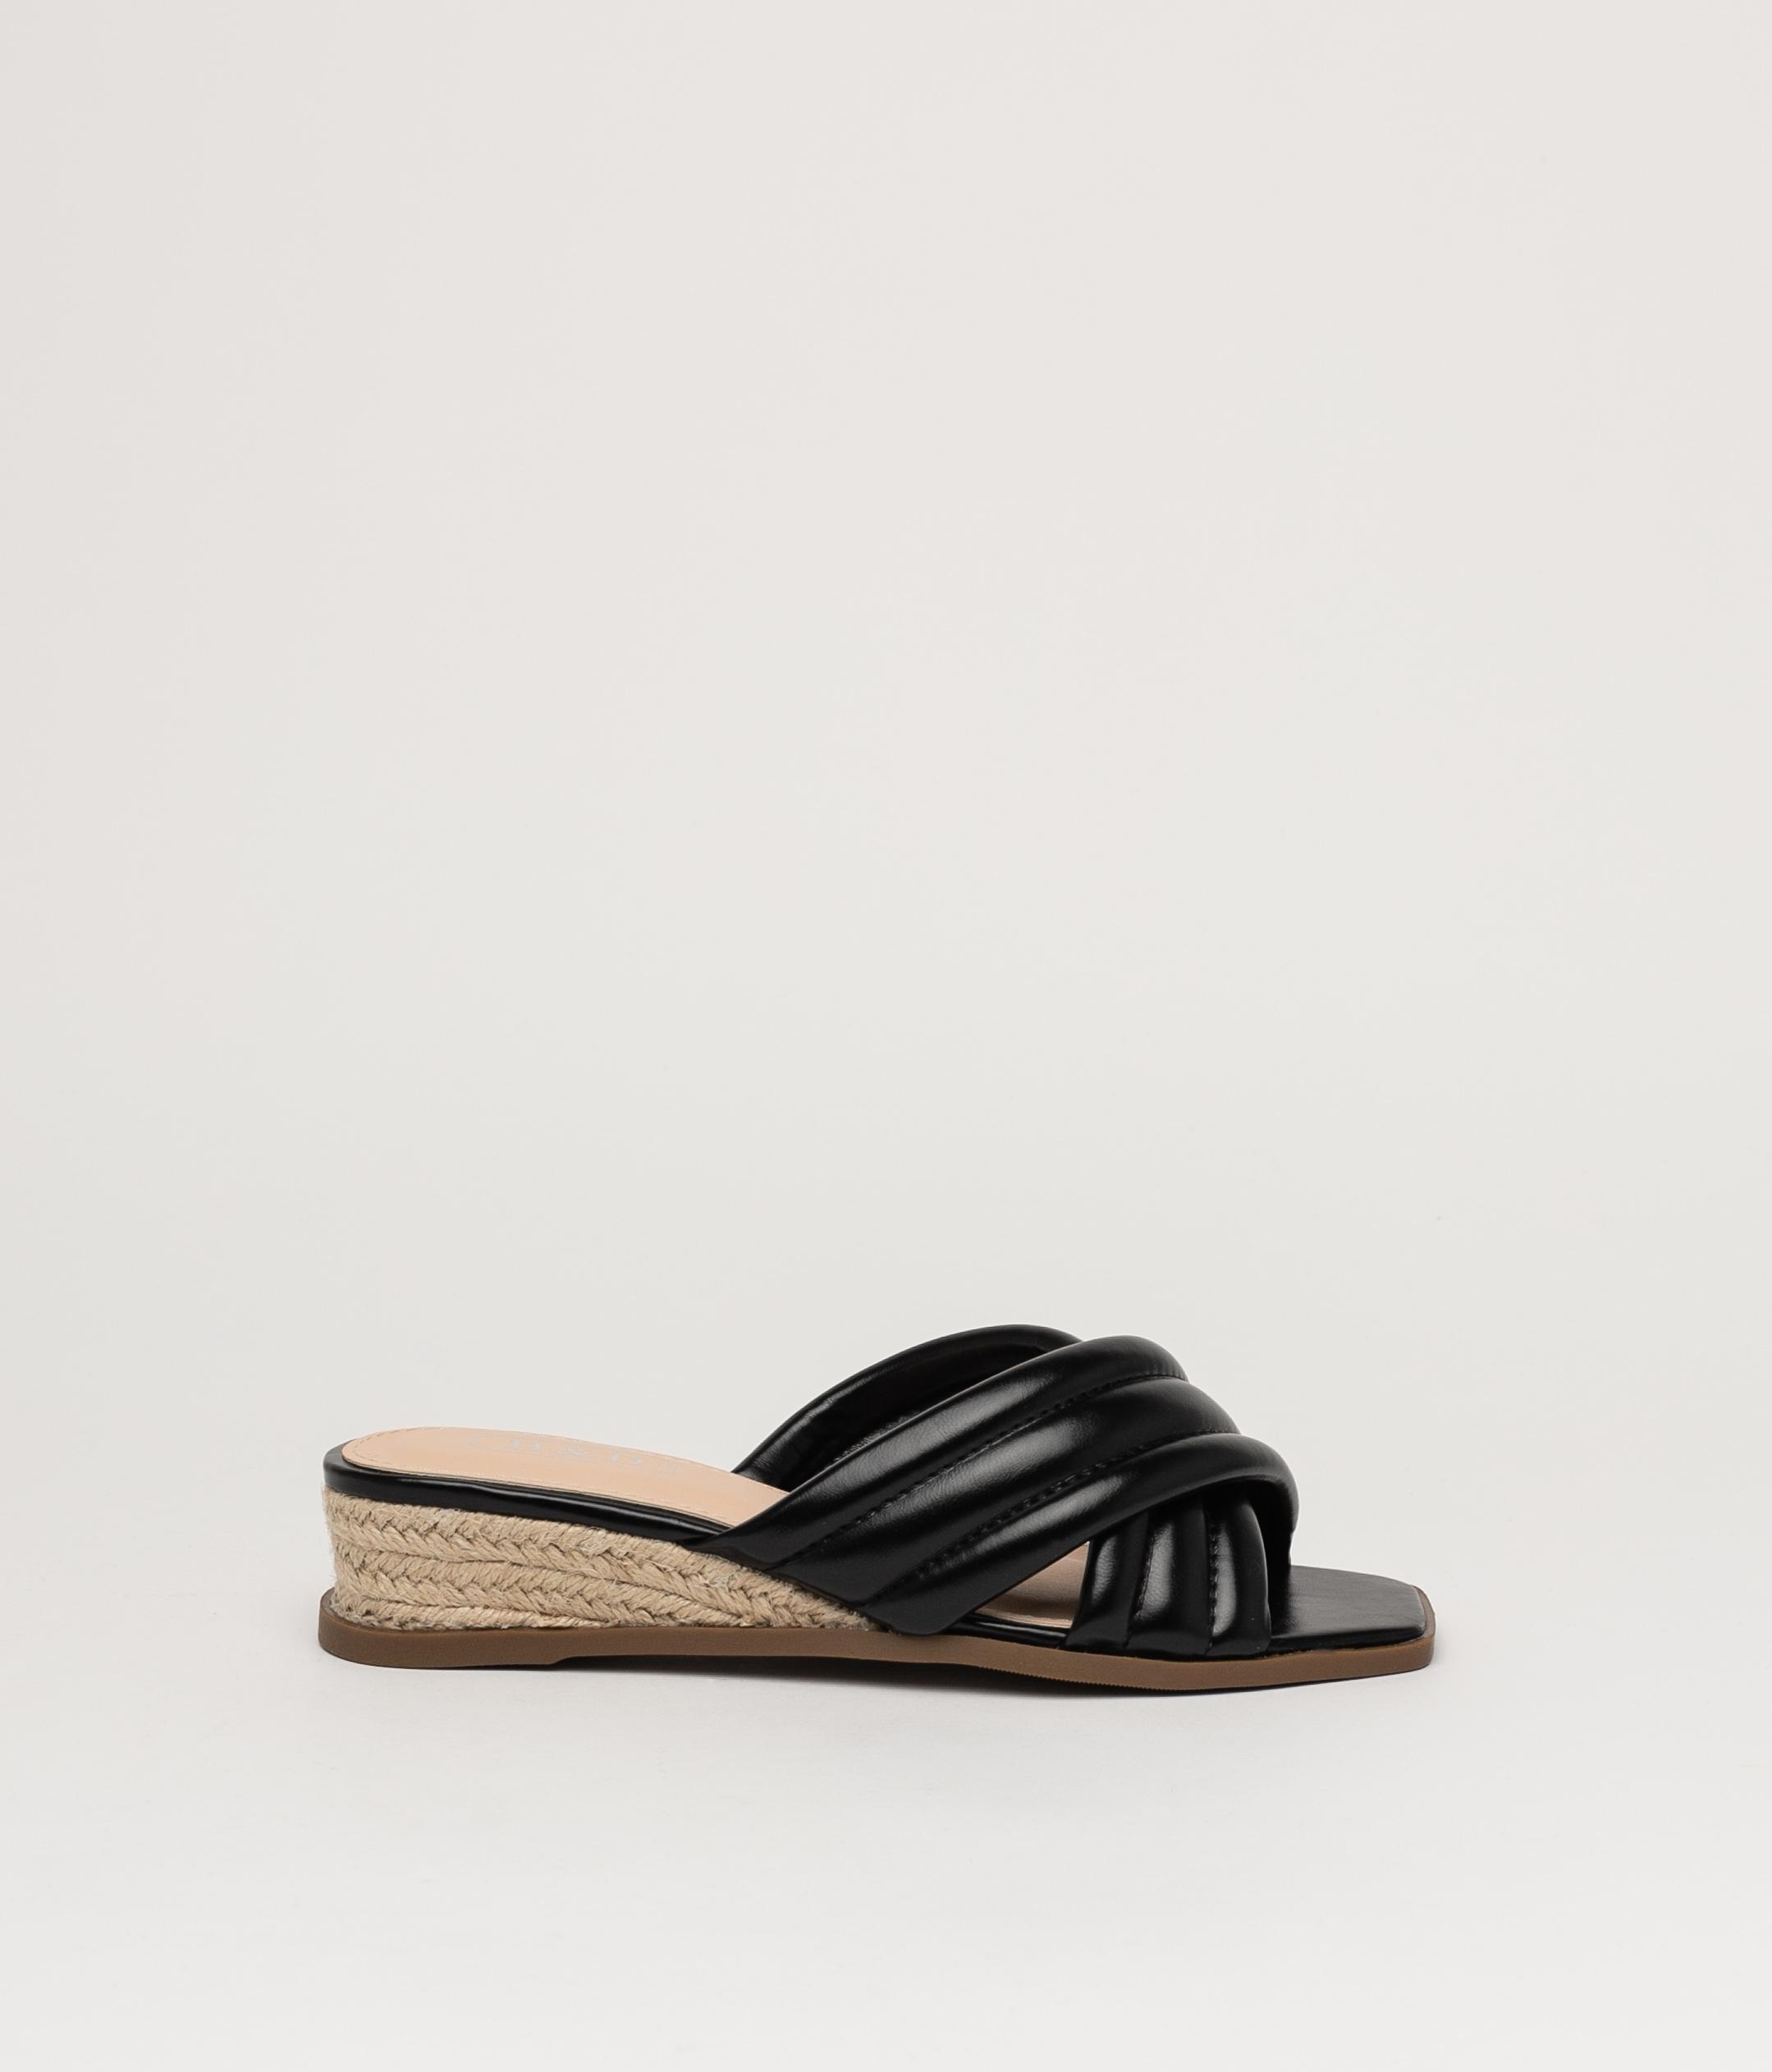 COLETO SANDAL - BLACK